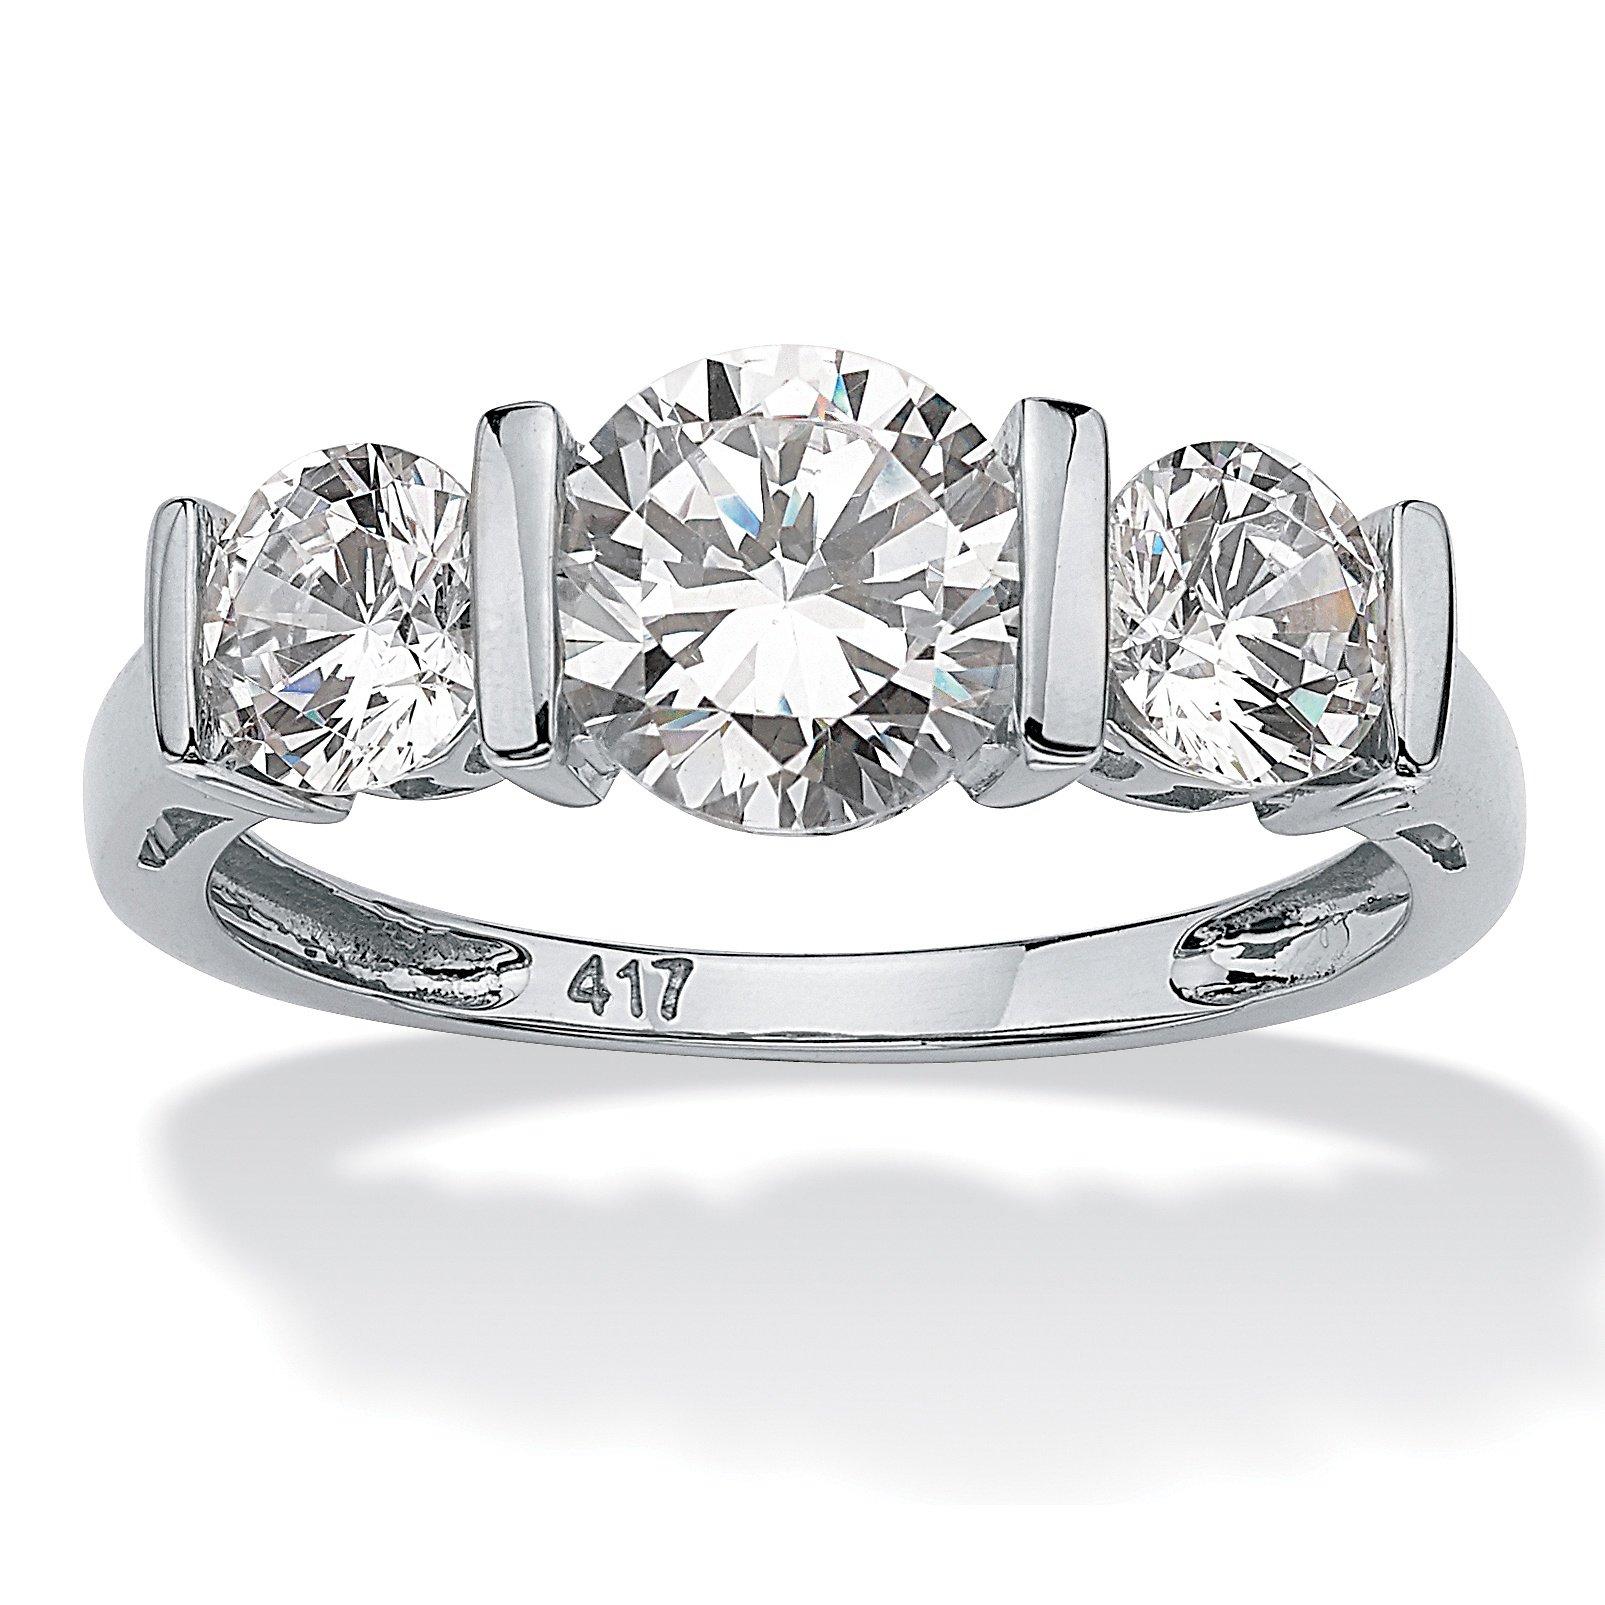 Solid 10K White Gold Round Cubic Zirconia Bar-Set 3-Stone Wedding Anniversary Ring Size 8